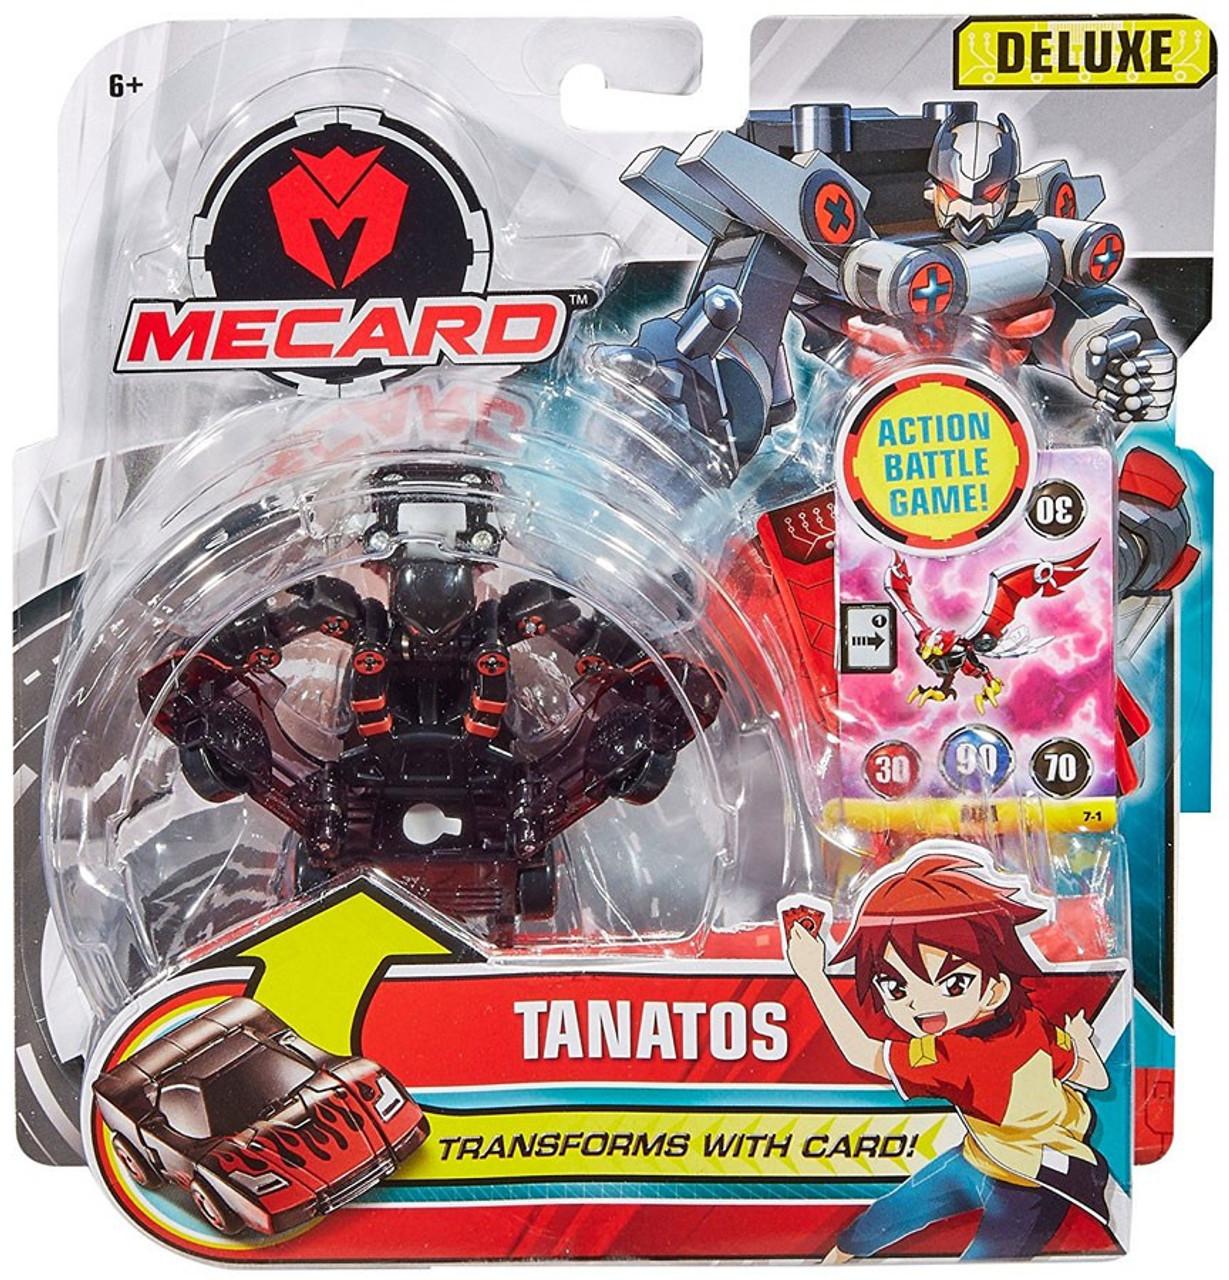 690ad3cf4eb MeCard Deluxe Mecardimal Tanatos Figure Mattel - ToyWiz